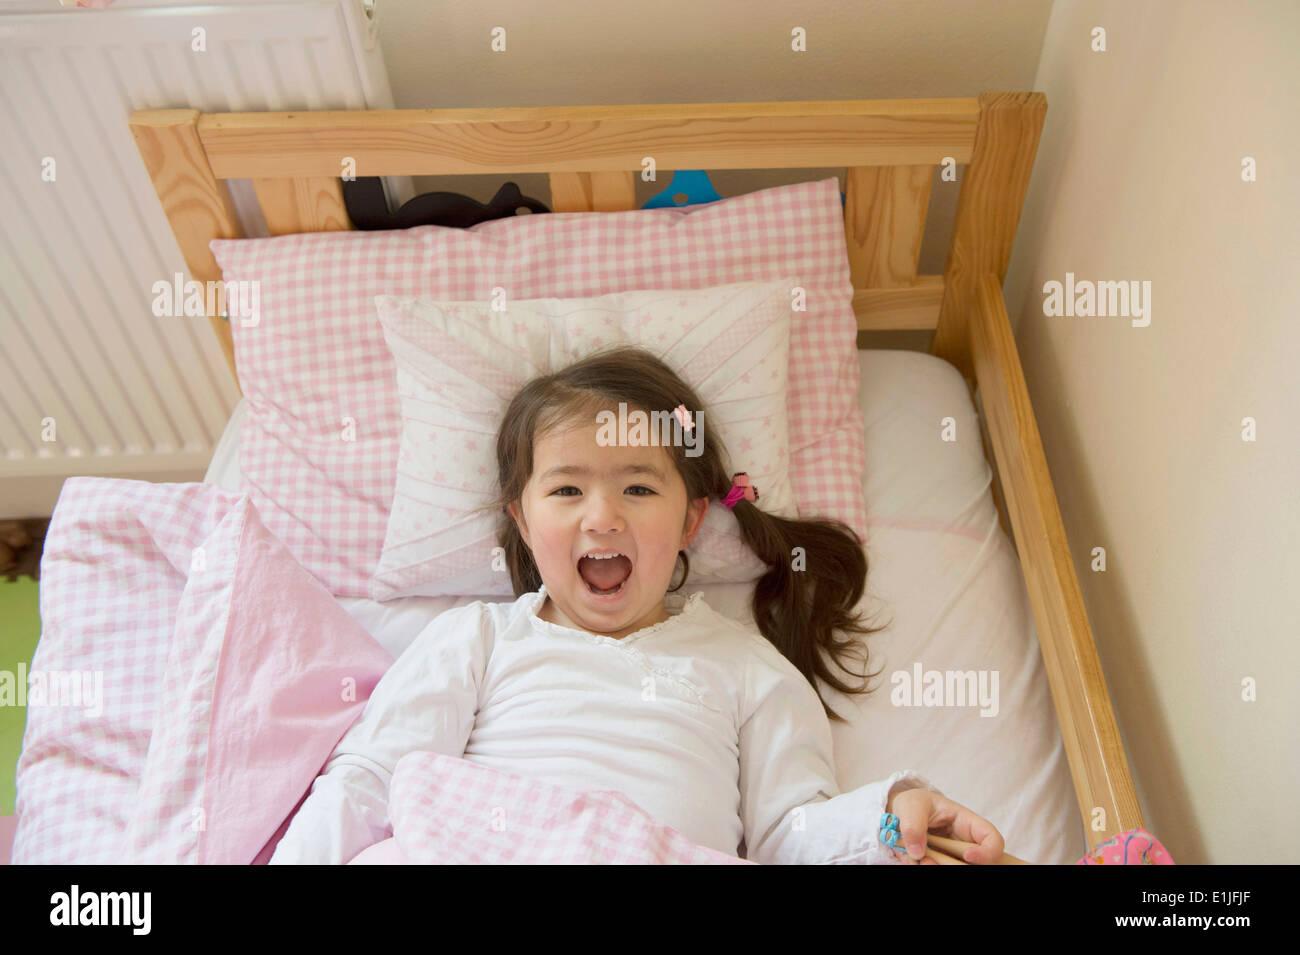 Girl at bedtime - Stock Image